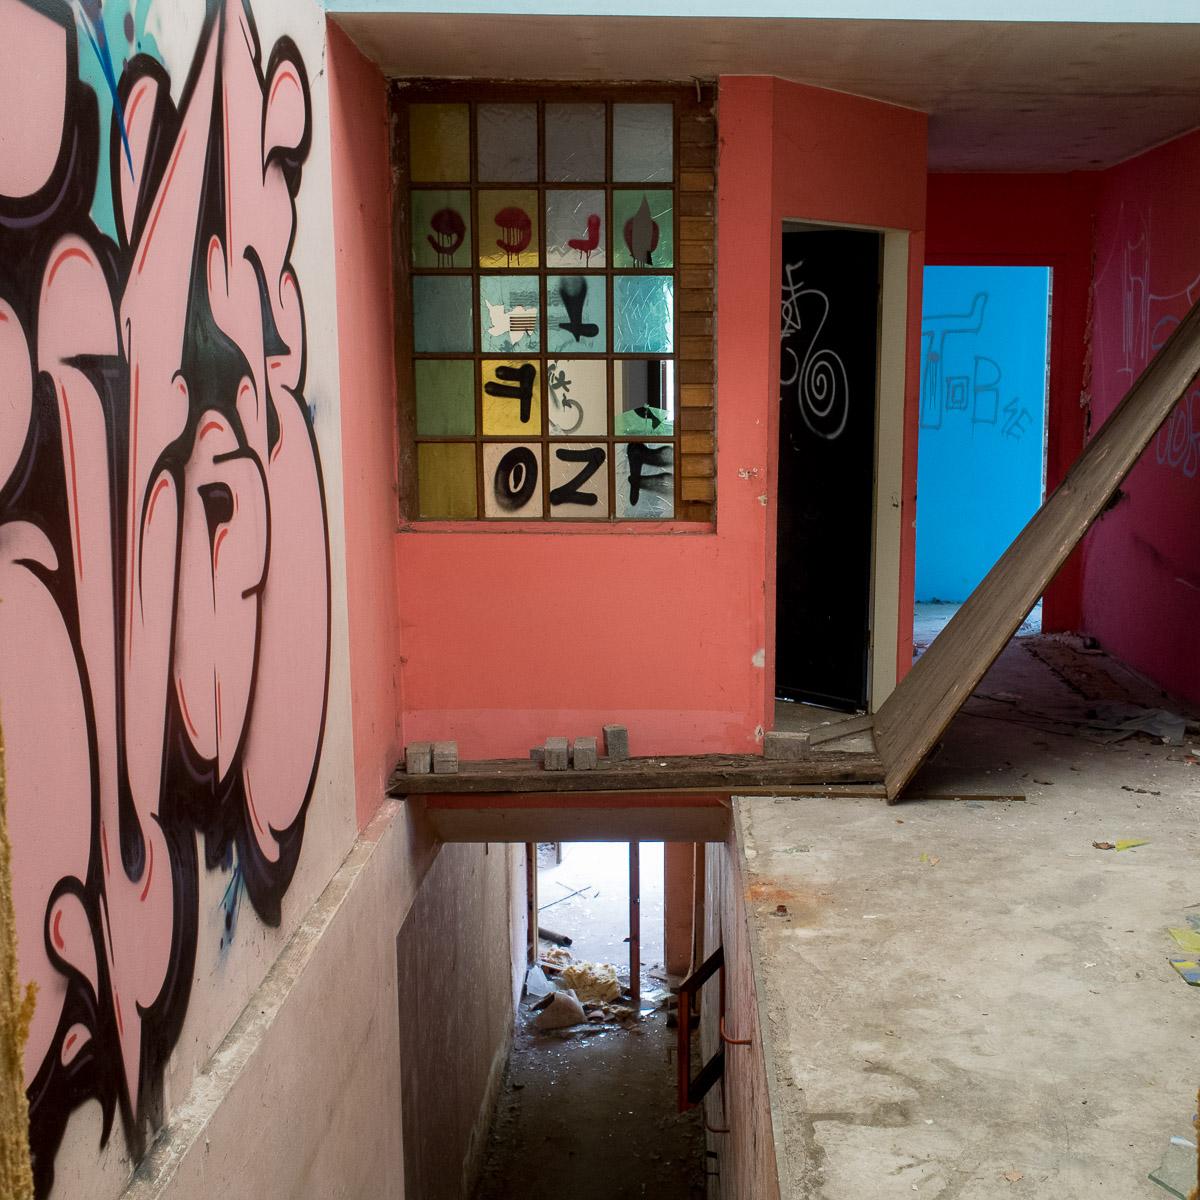 2014-04-17 EM1 Lost Place - Alte Ziegelei - Naurod 0044